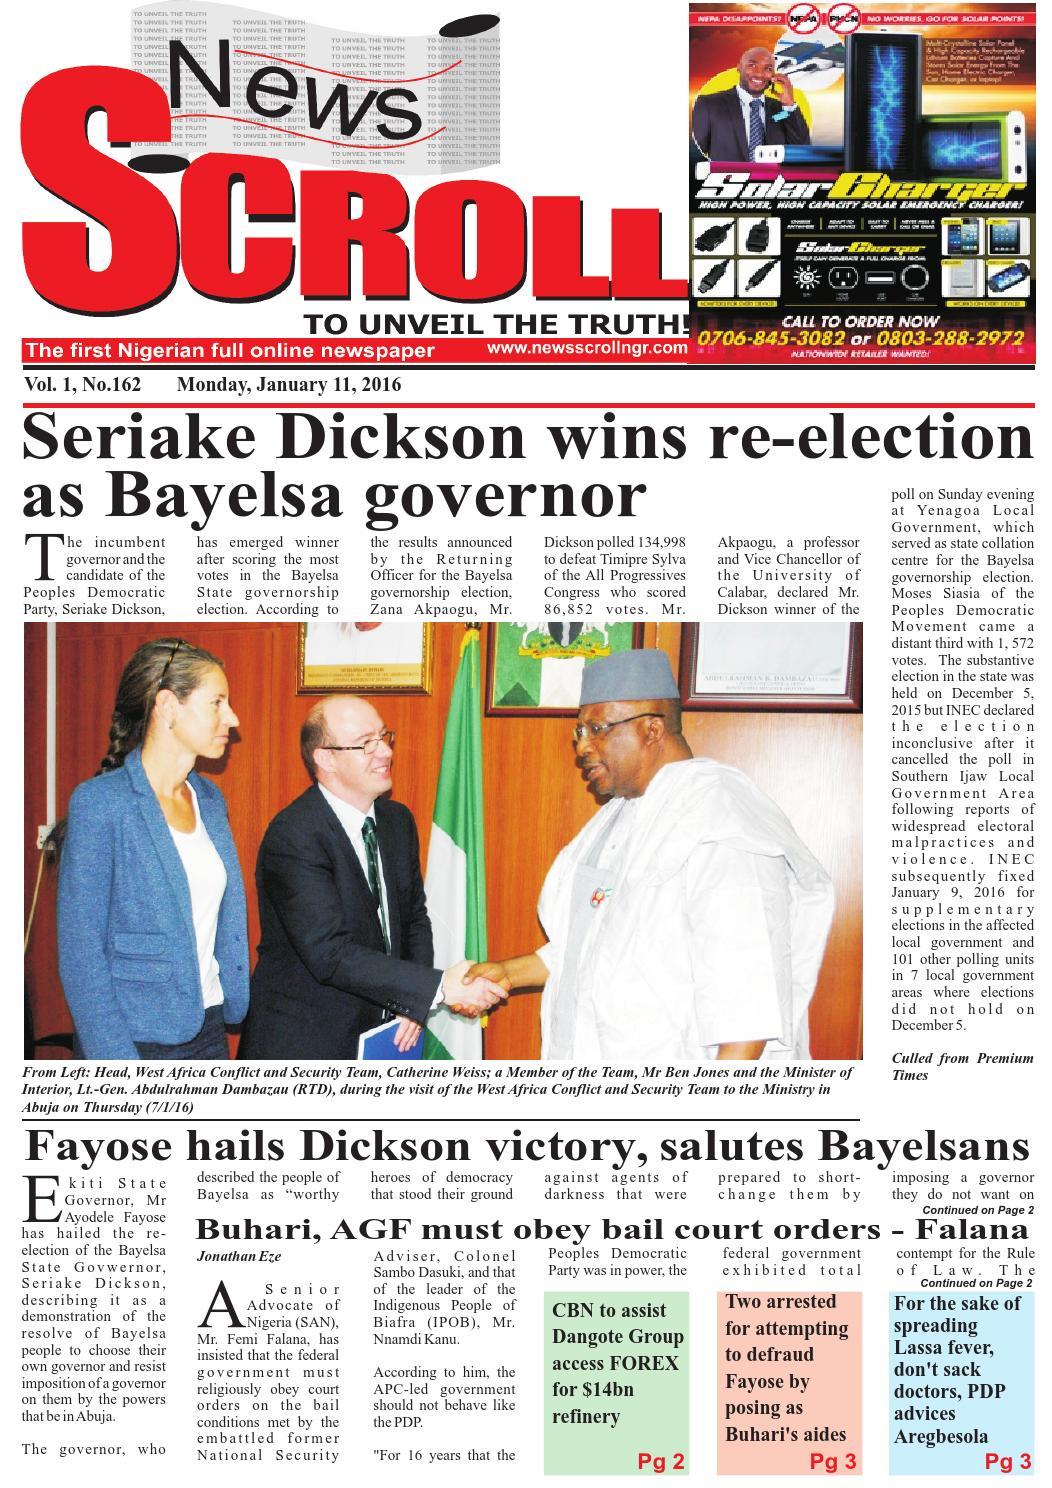 E-NewsScroll January 11, 2016 by NewsSCscroll - issuu